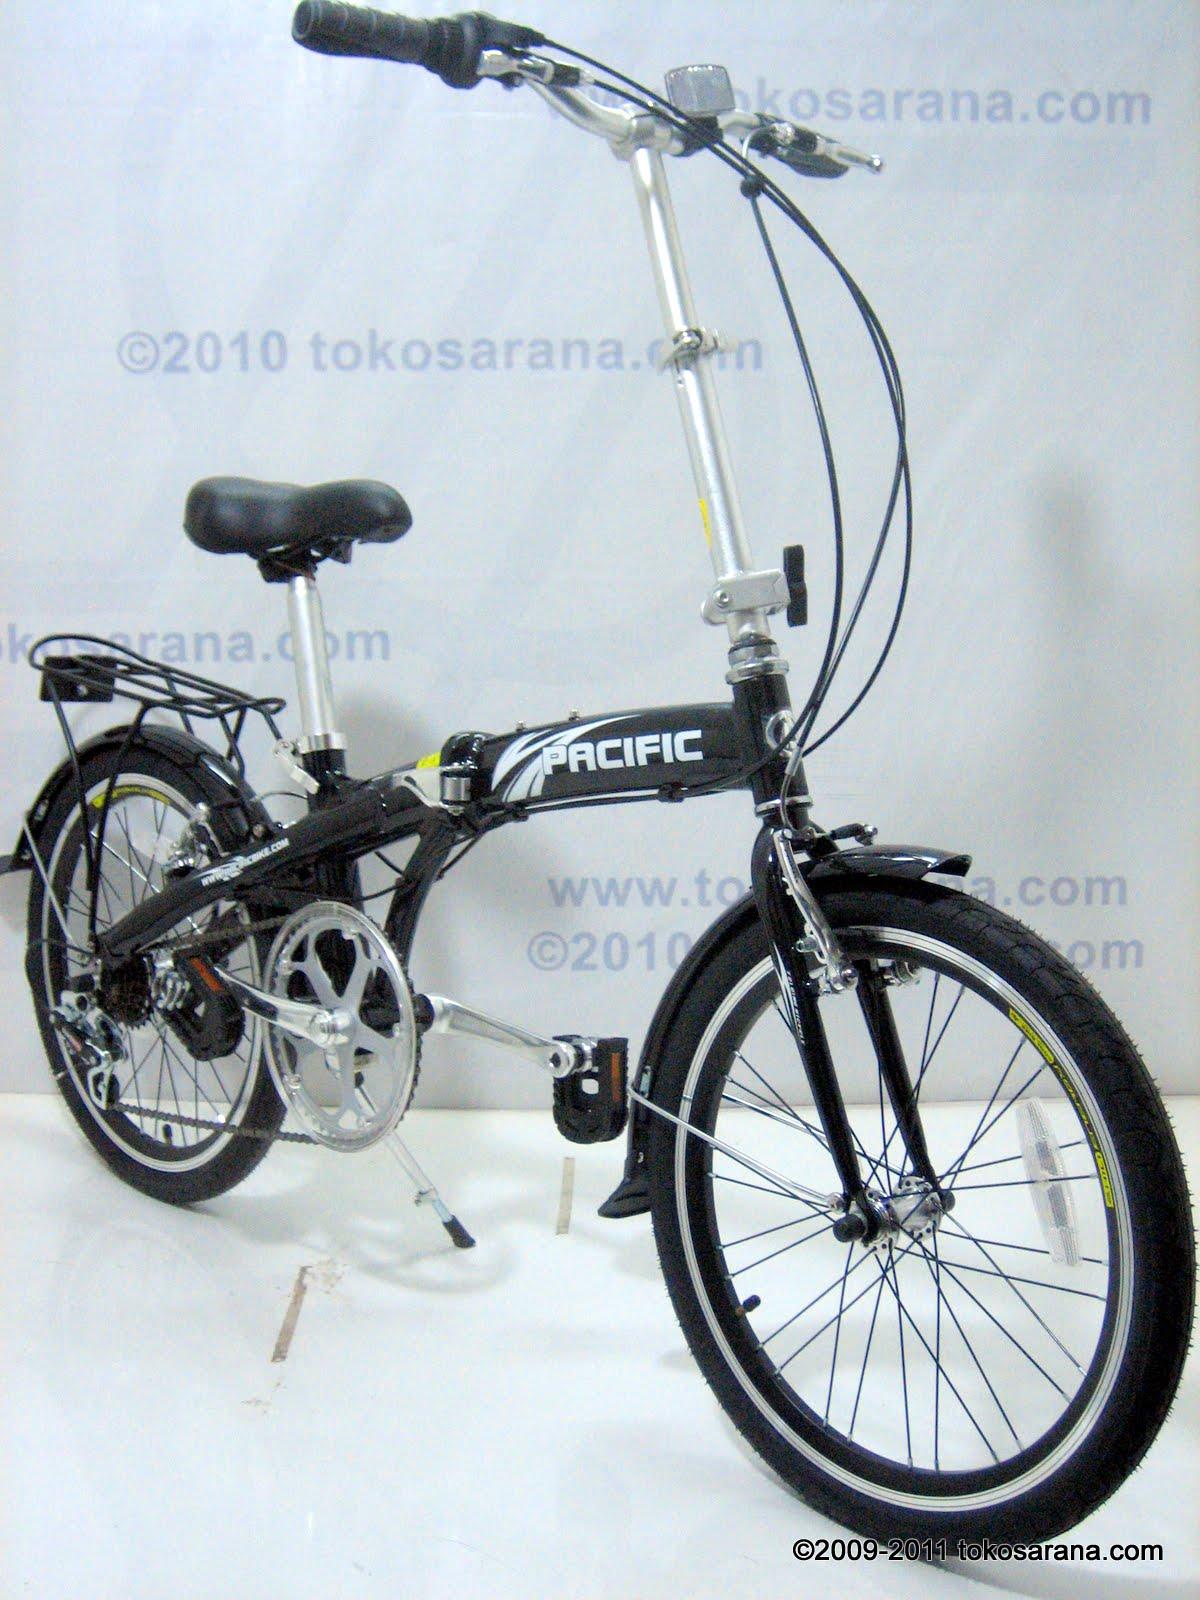 ABADI SHOPP: Sepeda Lipat Pacific Alloy Frame 20 Inch